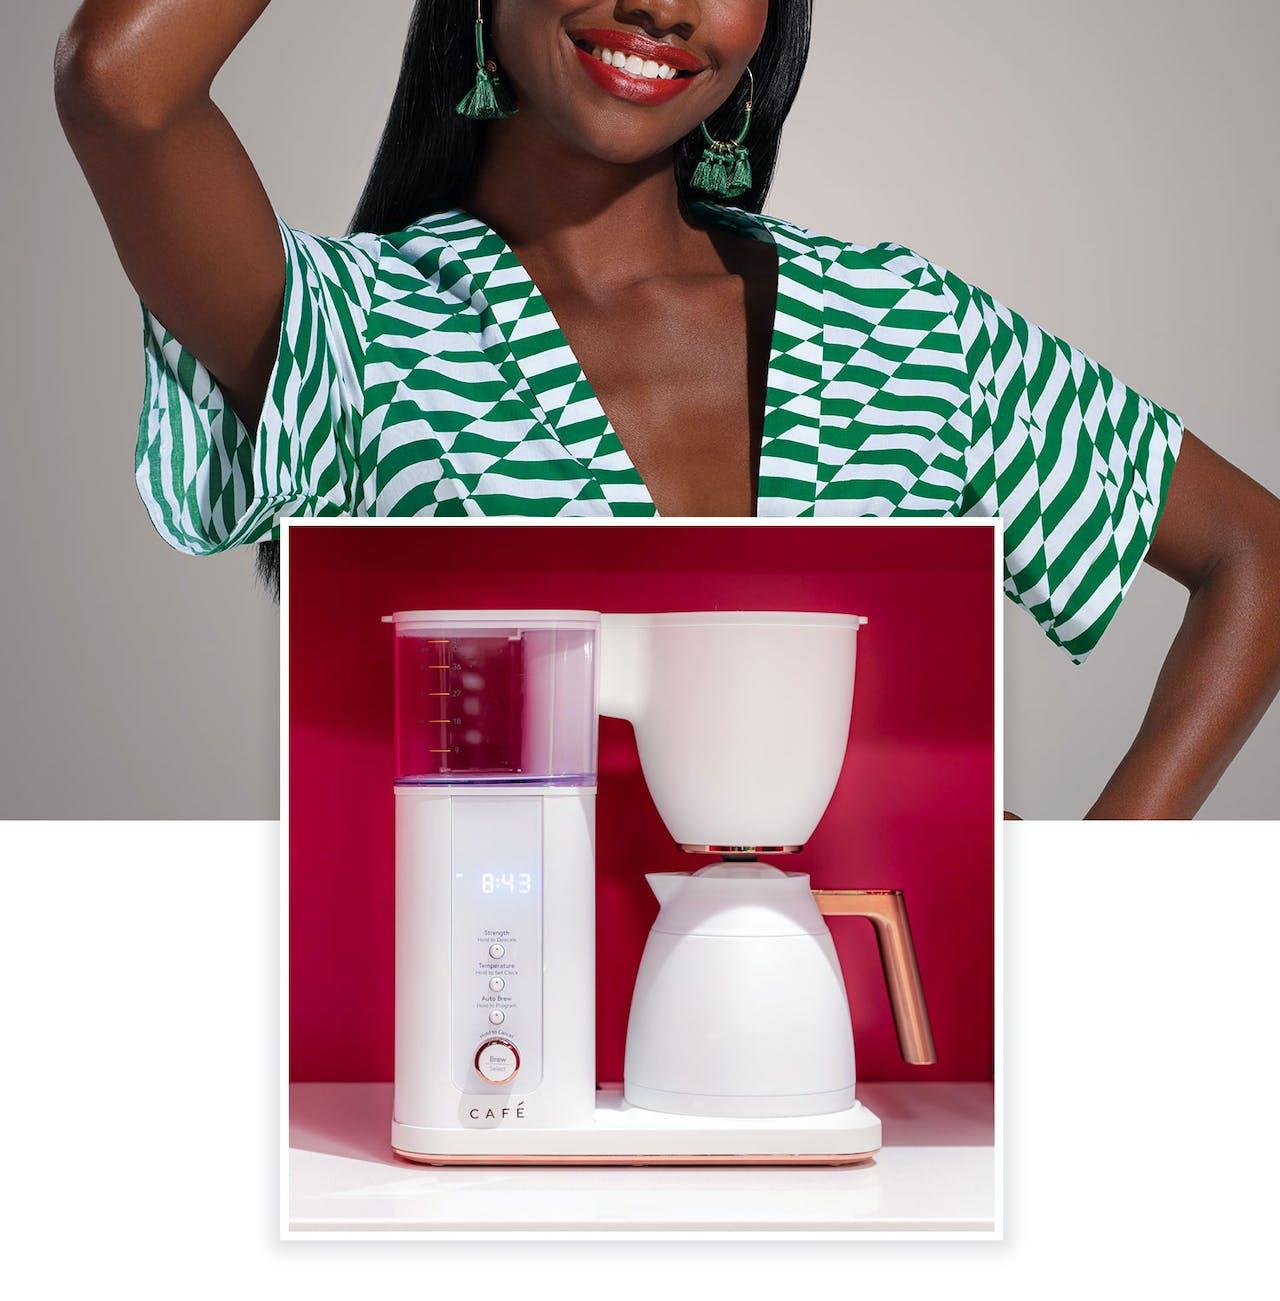 model in background Café Matte white coffeemaker in foreground